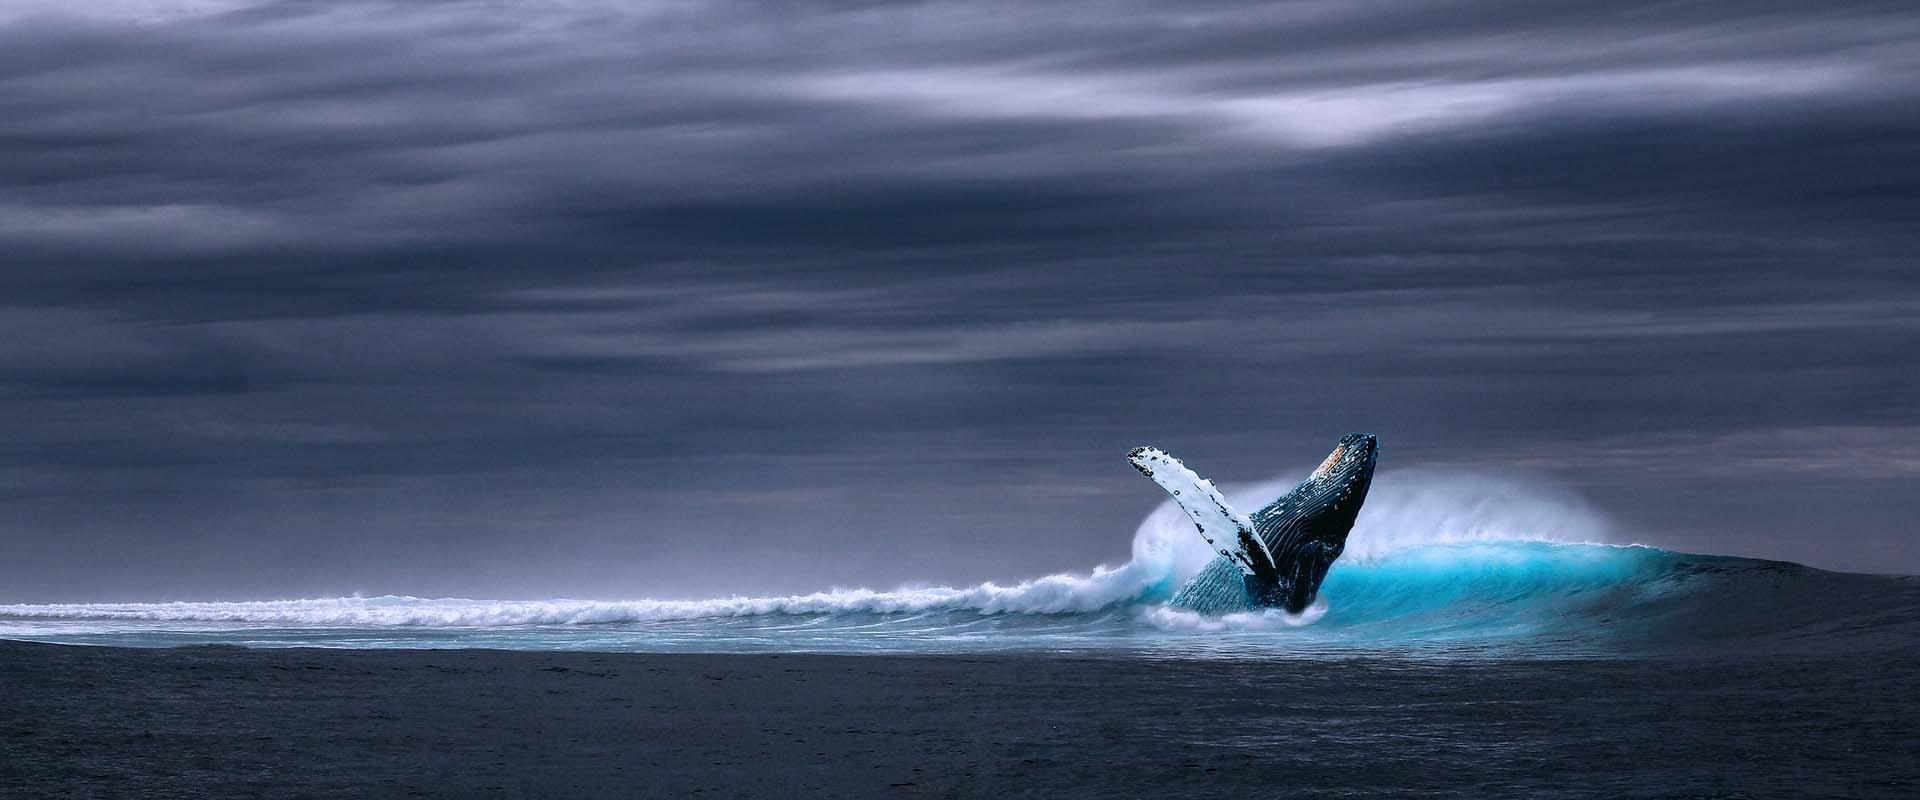 Charter Oceans for All